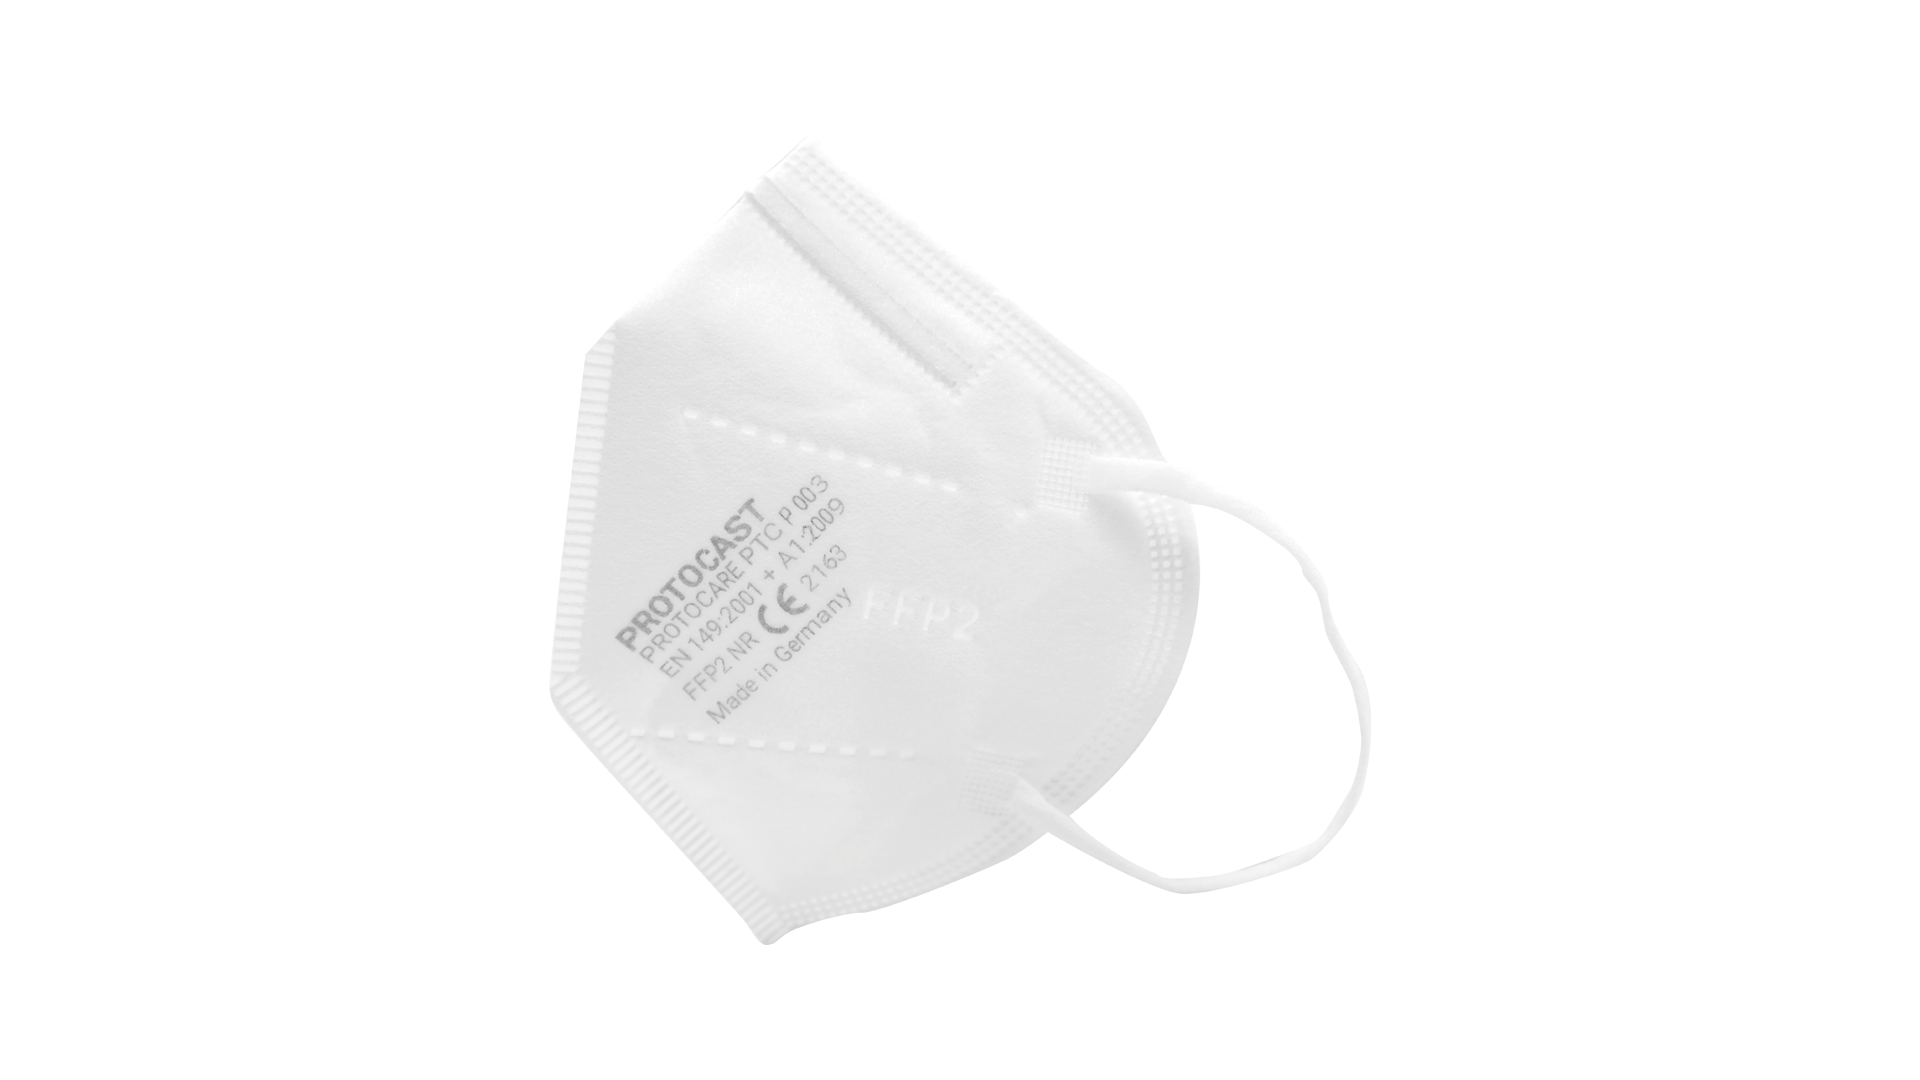 FFP2 NR Atemschutzmaske 50er Pack